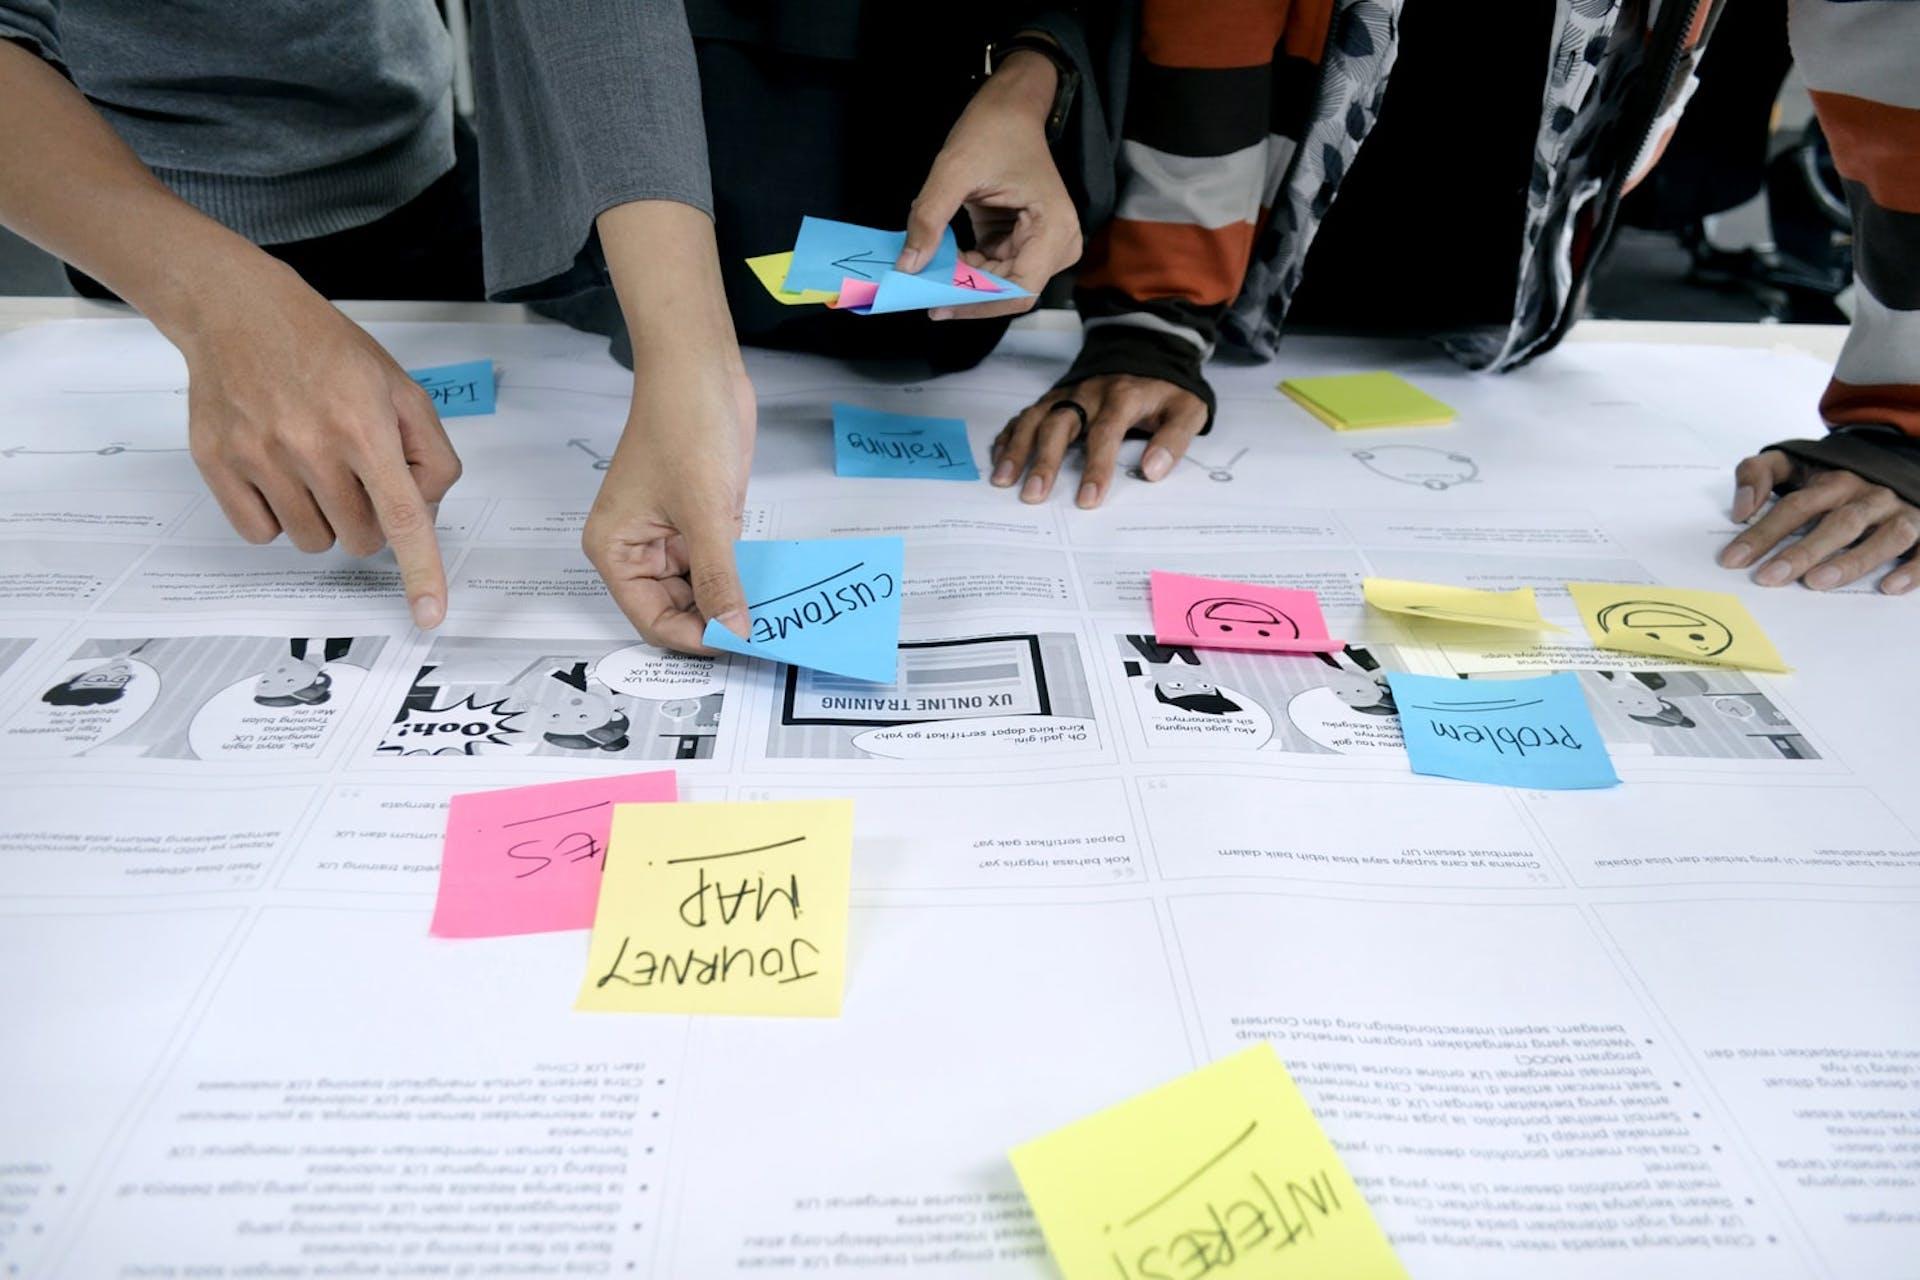 Proceso de decisión de compra: las 5 etapas para conquistar a tus clientes